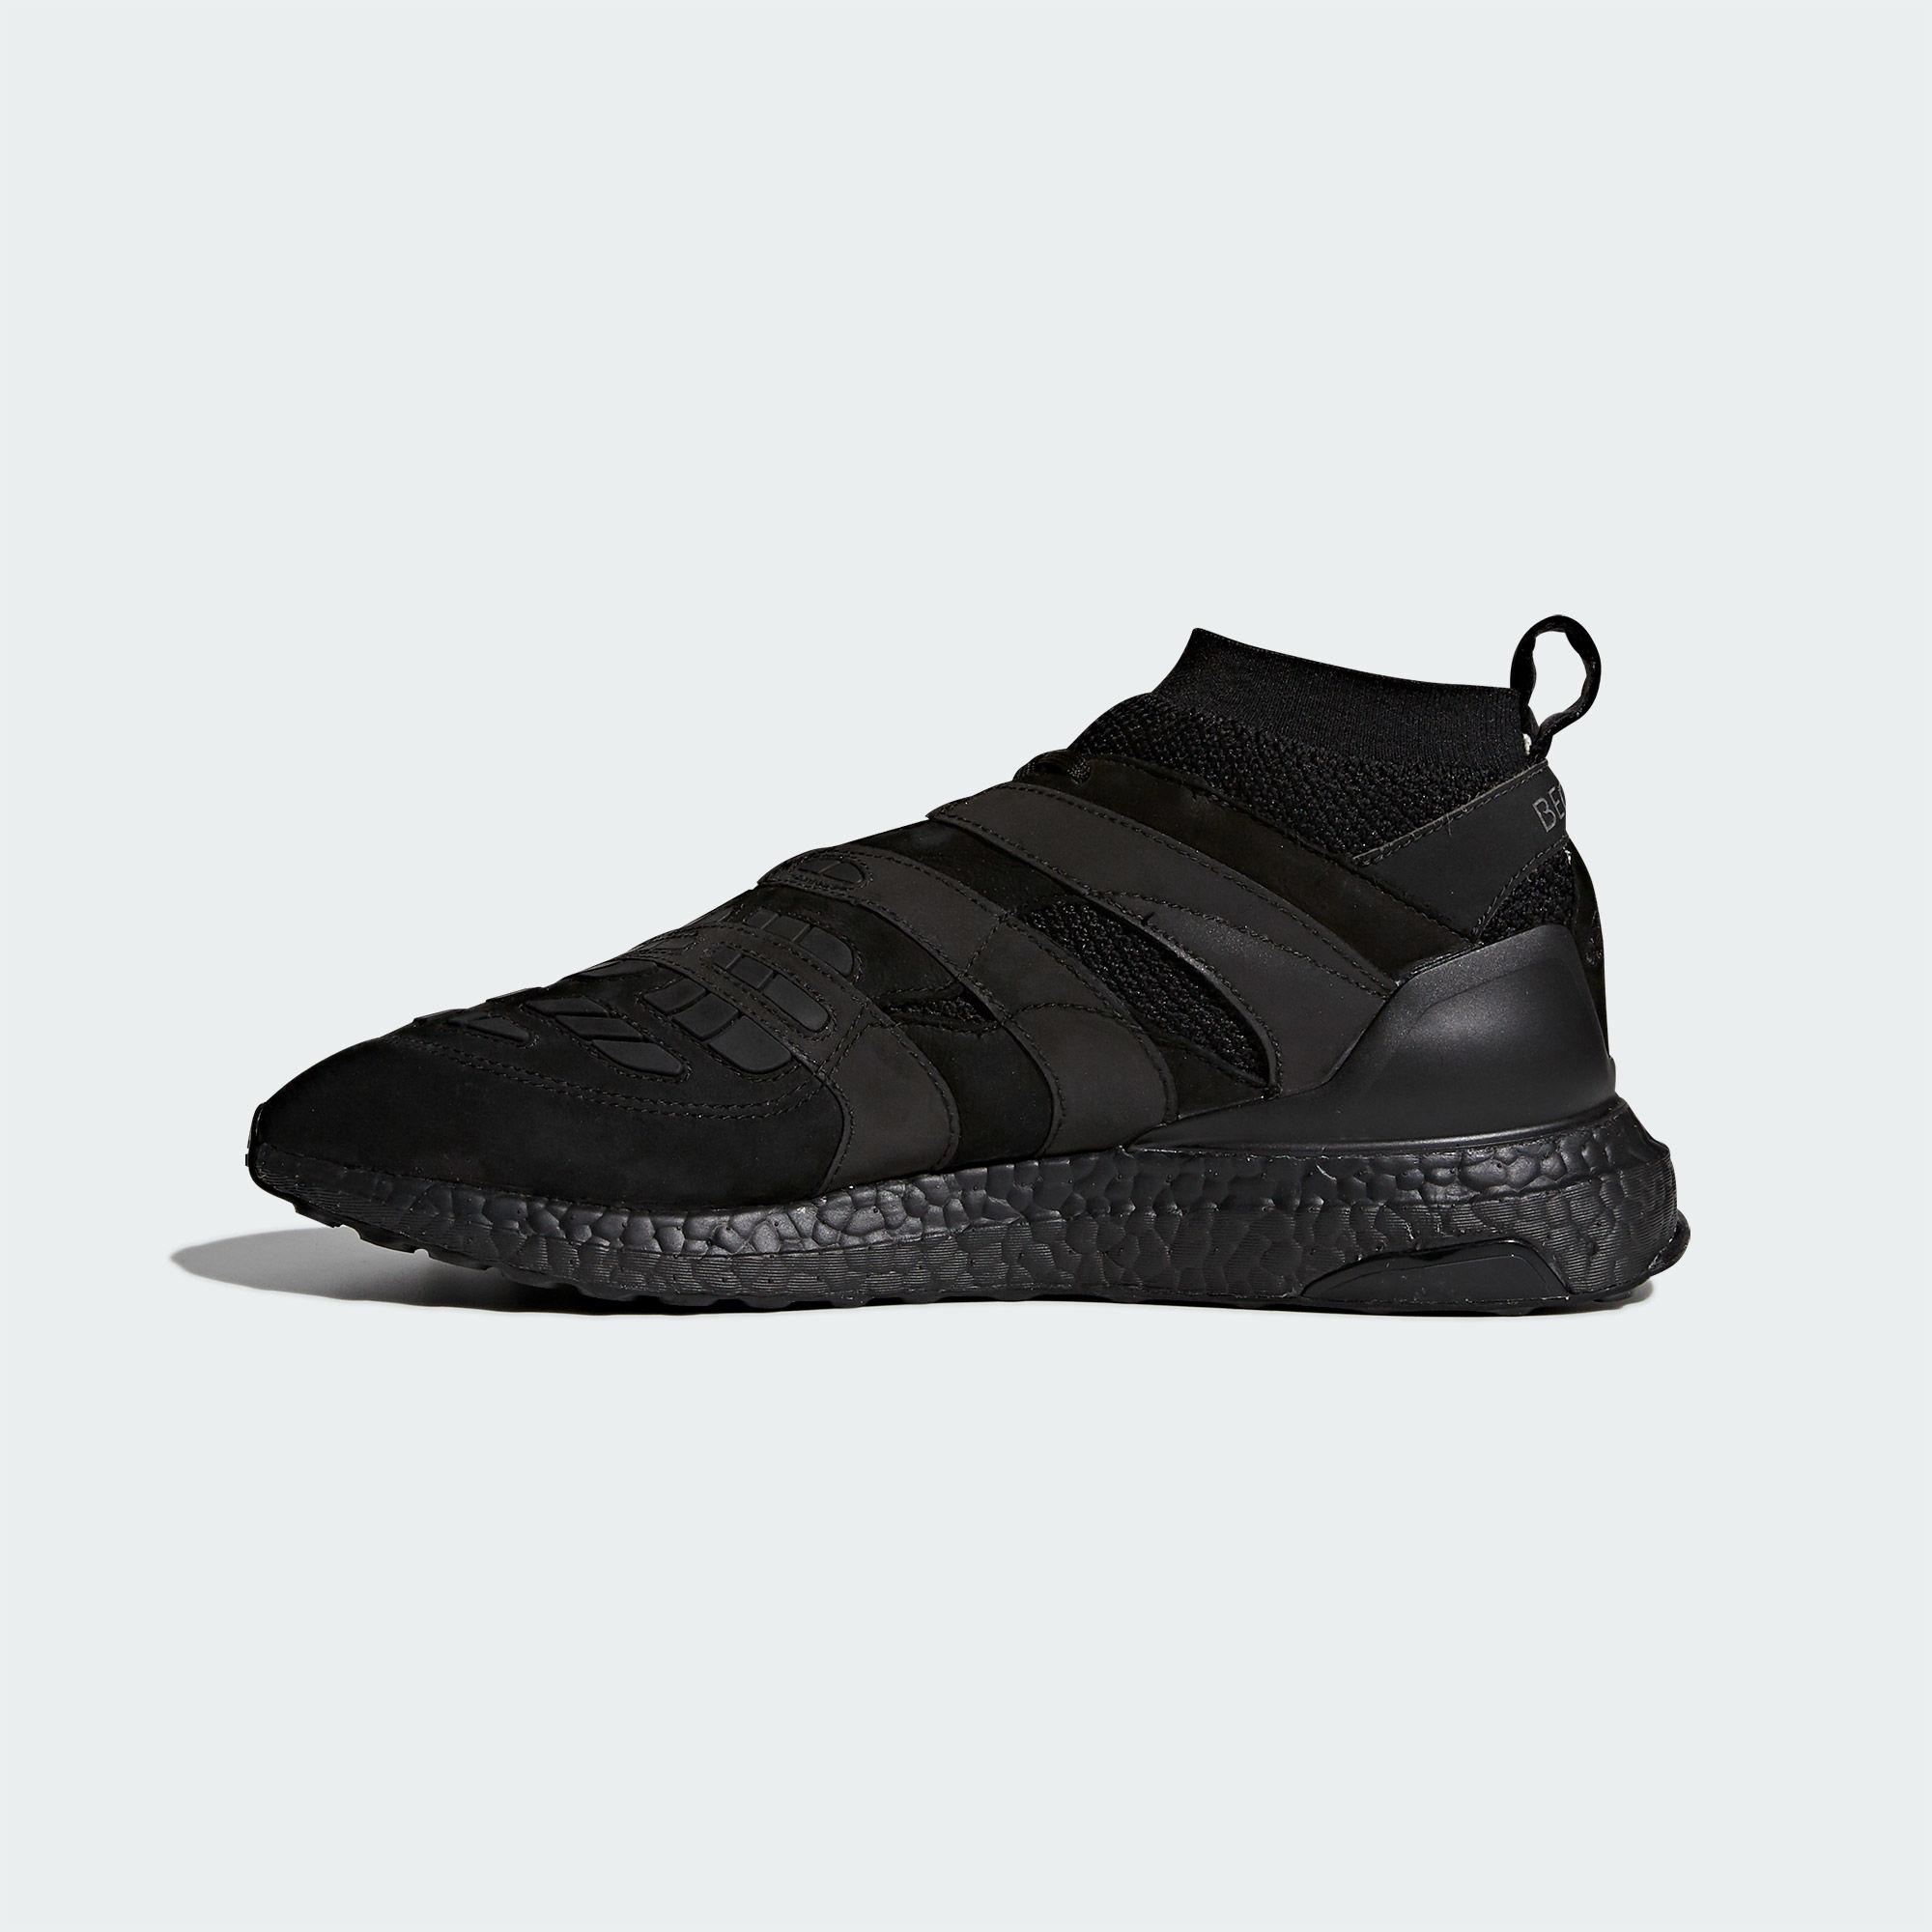 David Beckham Nike Shoes